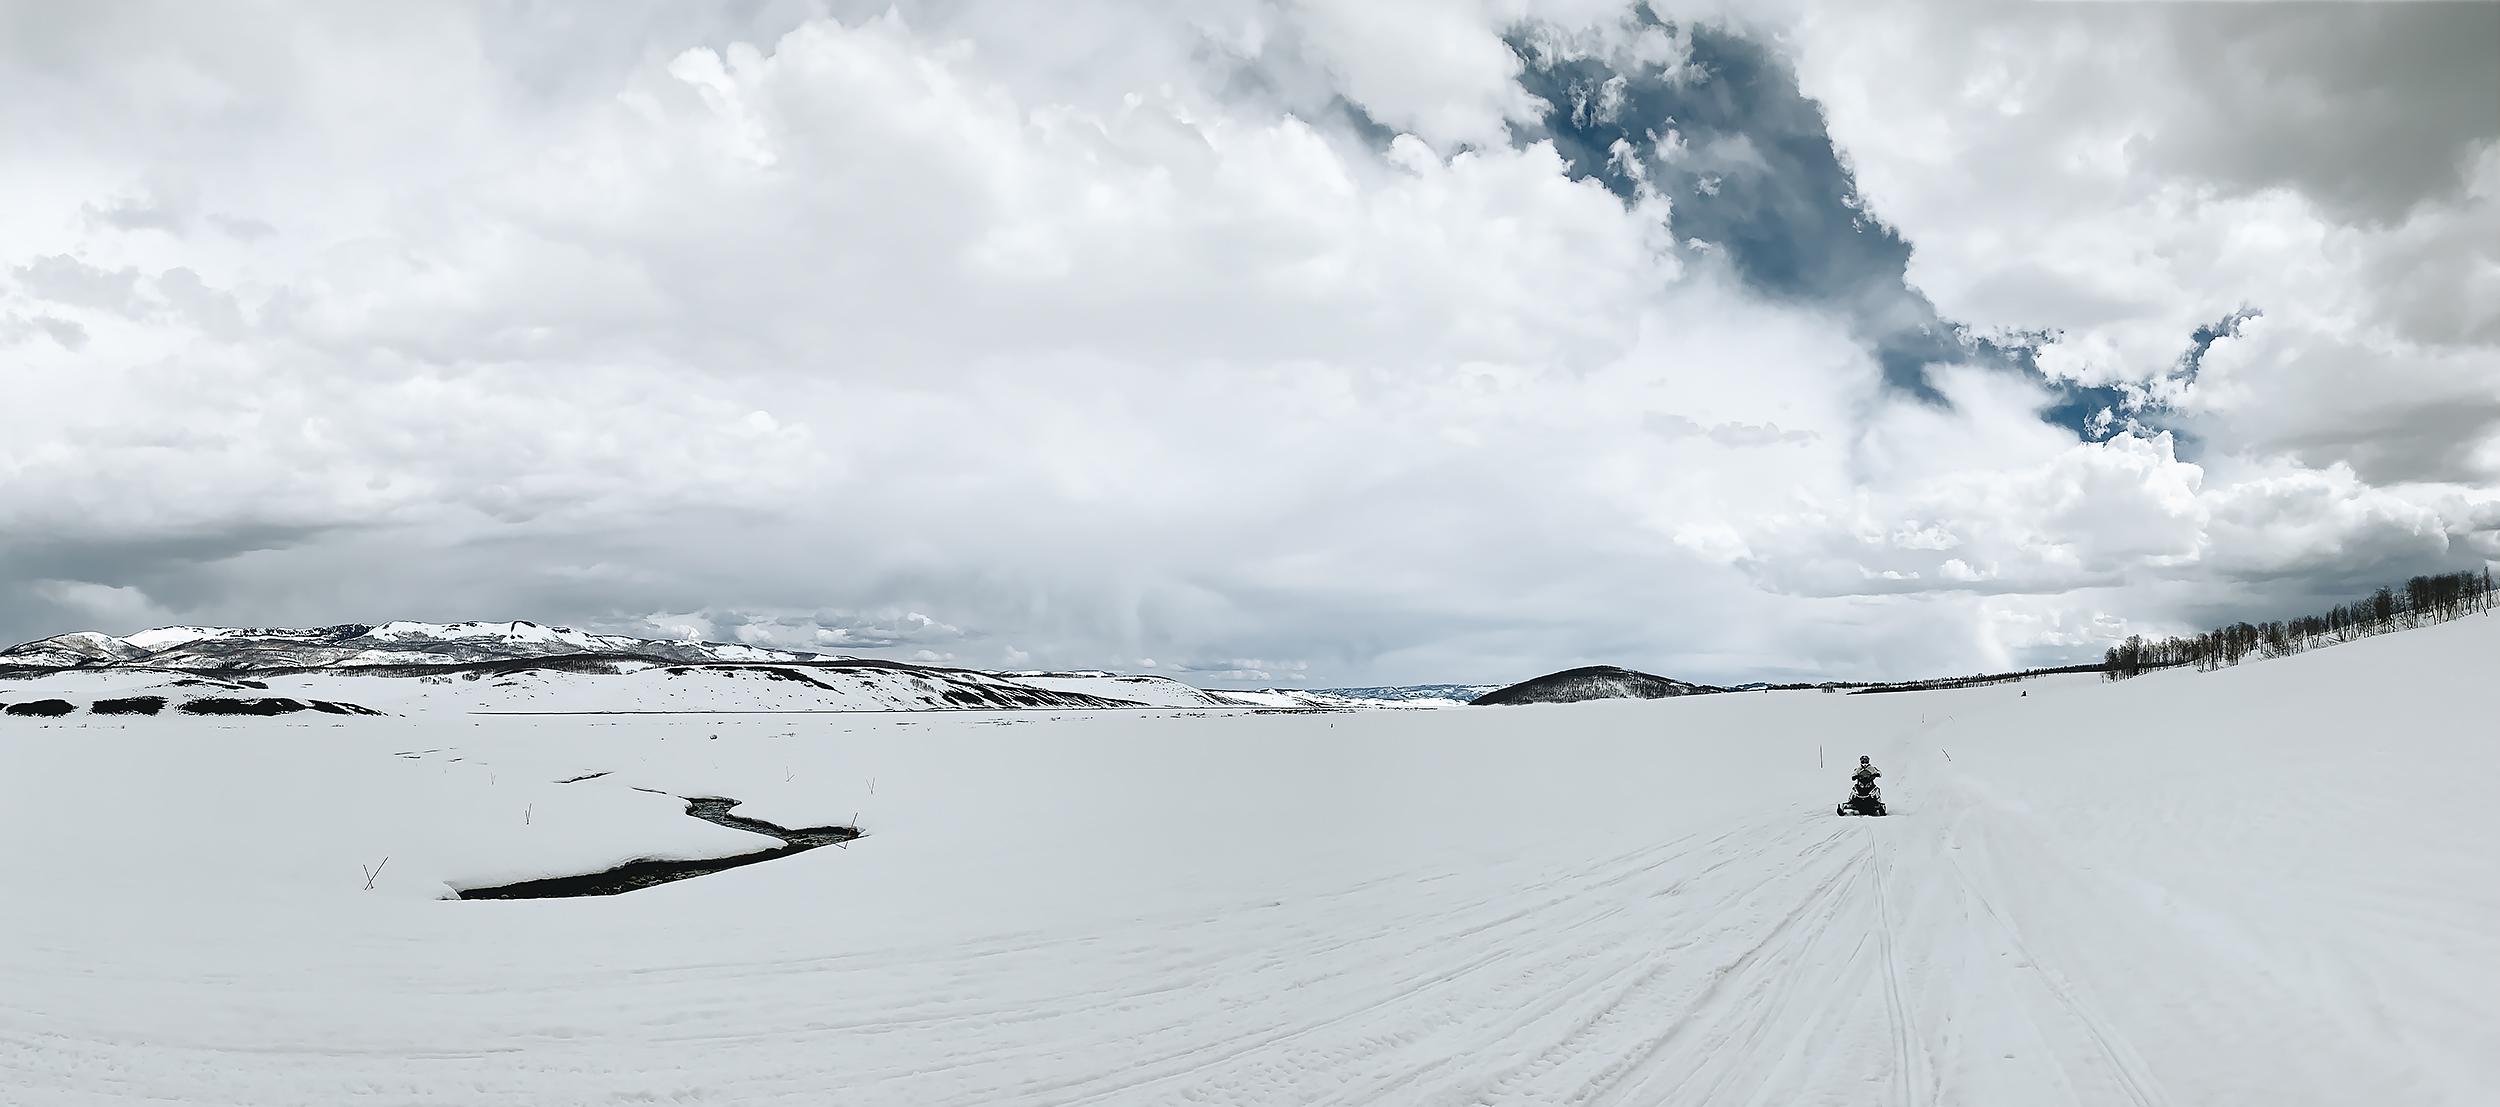 chrissihernandez-utah-parkcity-snowmobiling-panorama1-copy2500.jpg